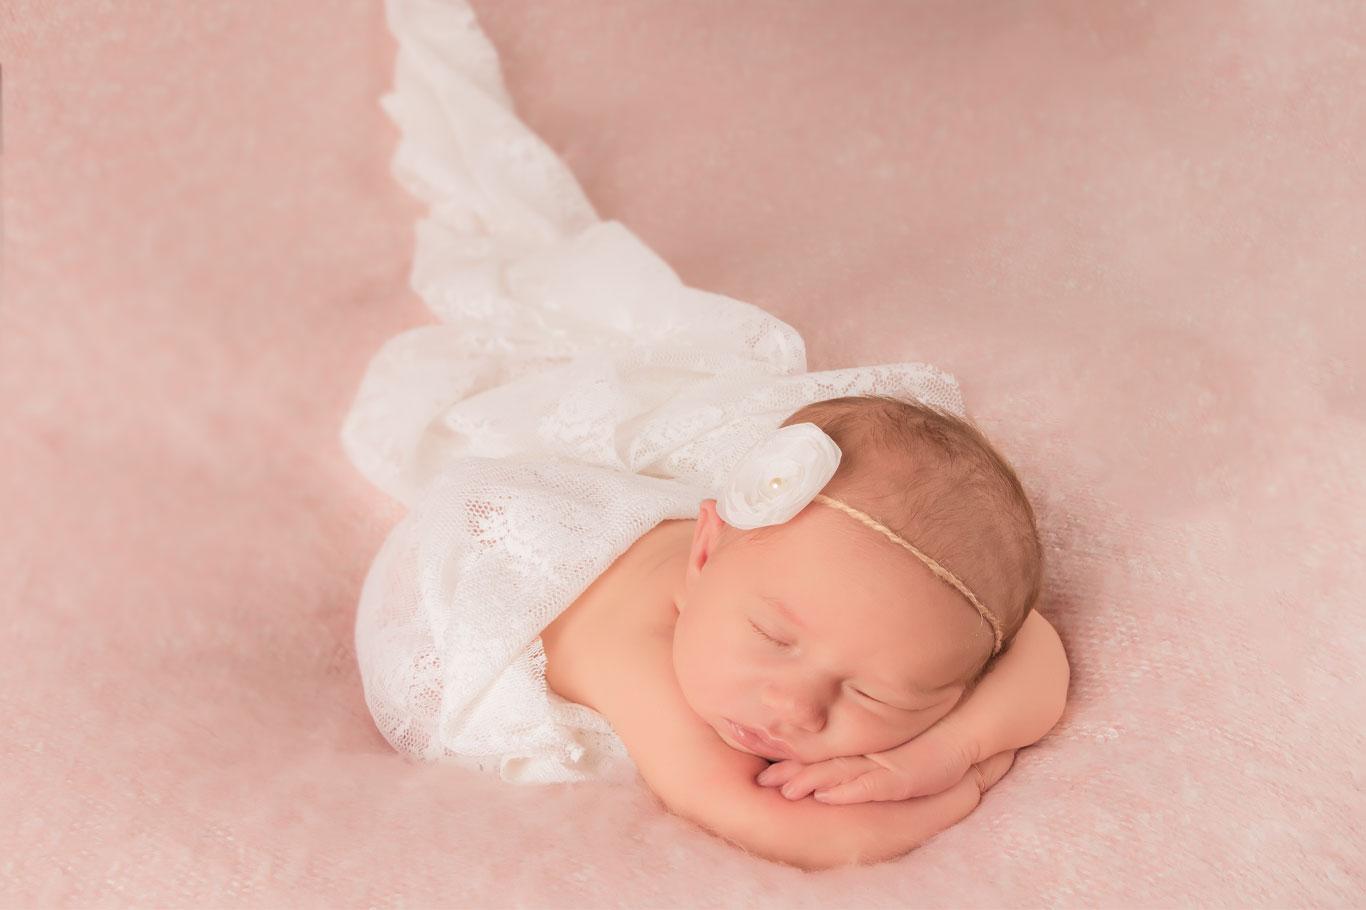 novorođena devojčica leži na stomaku sa rukicama ispod glave na roze pokrivaču